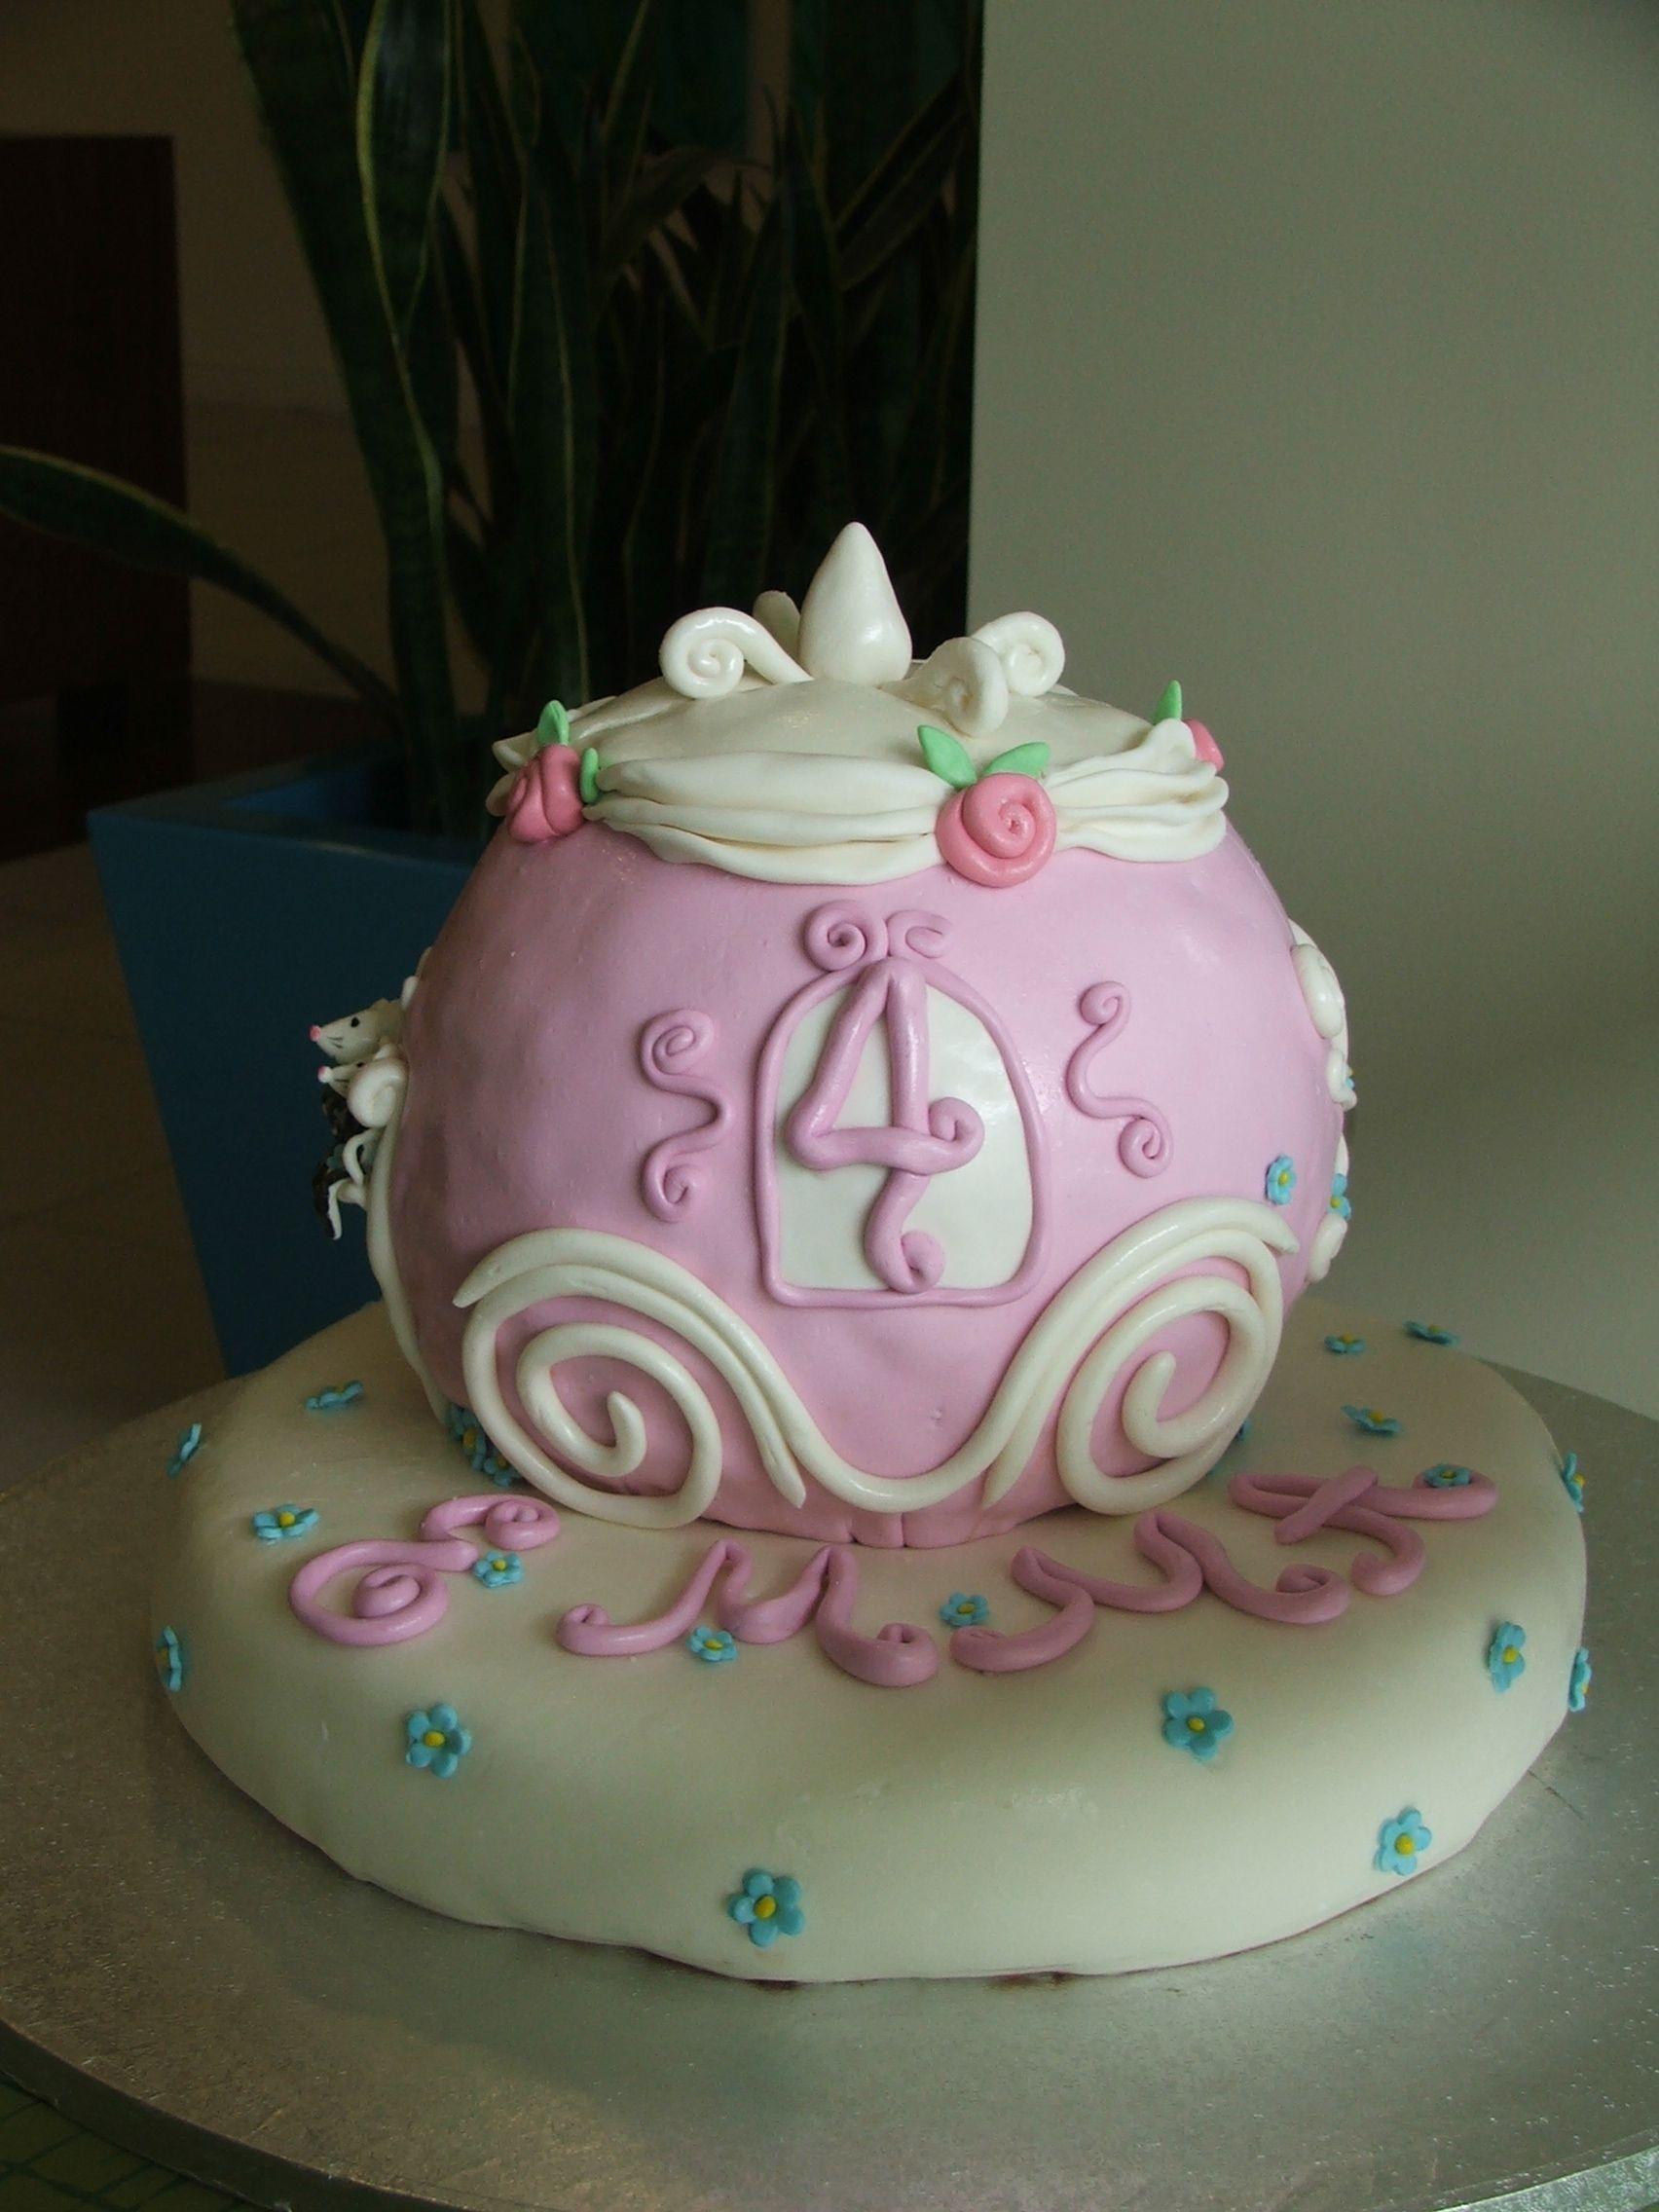 Cinderella Cake 2 jenna benna Pinterest Cake Birthdays and